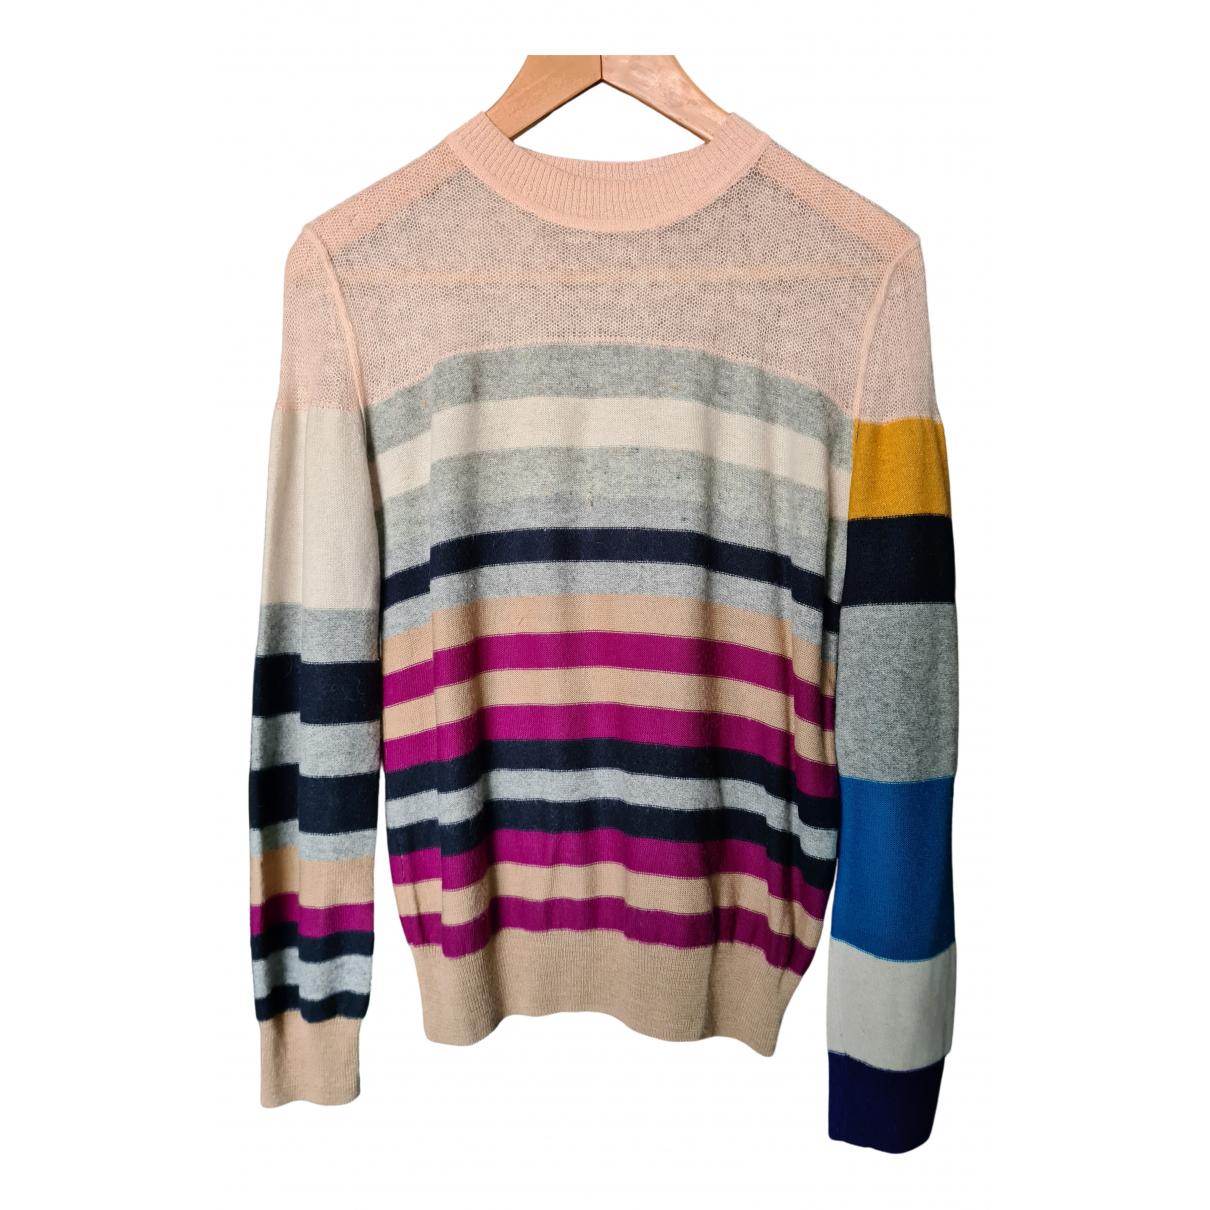 Sonia By Sonia Rykiel - Pull   pour femme en laine - multicolore